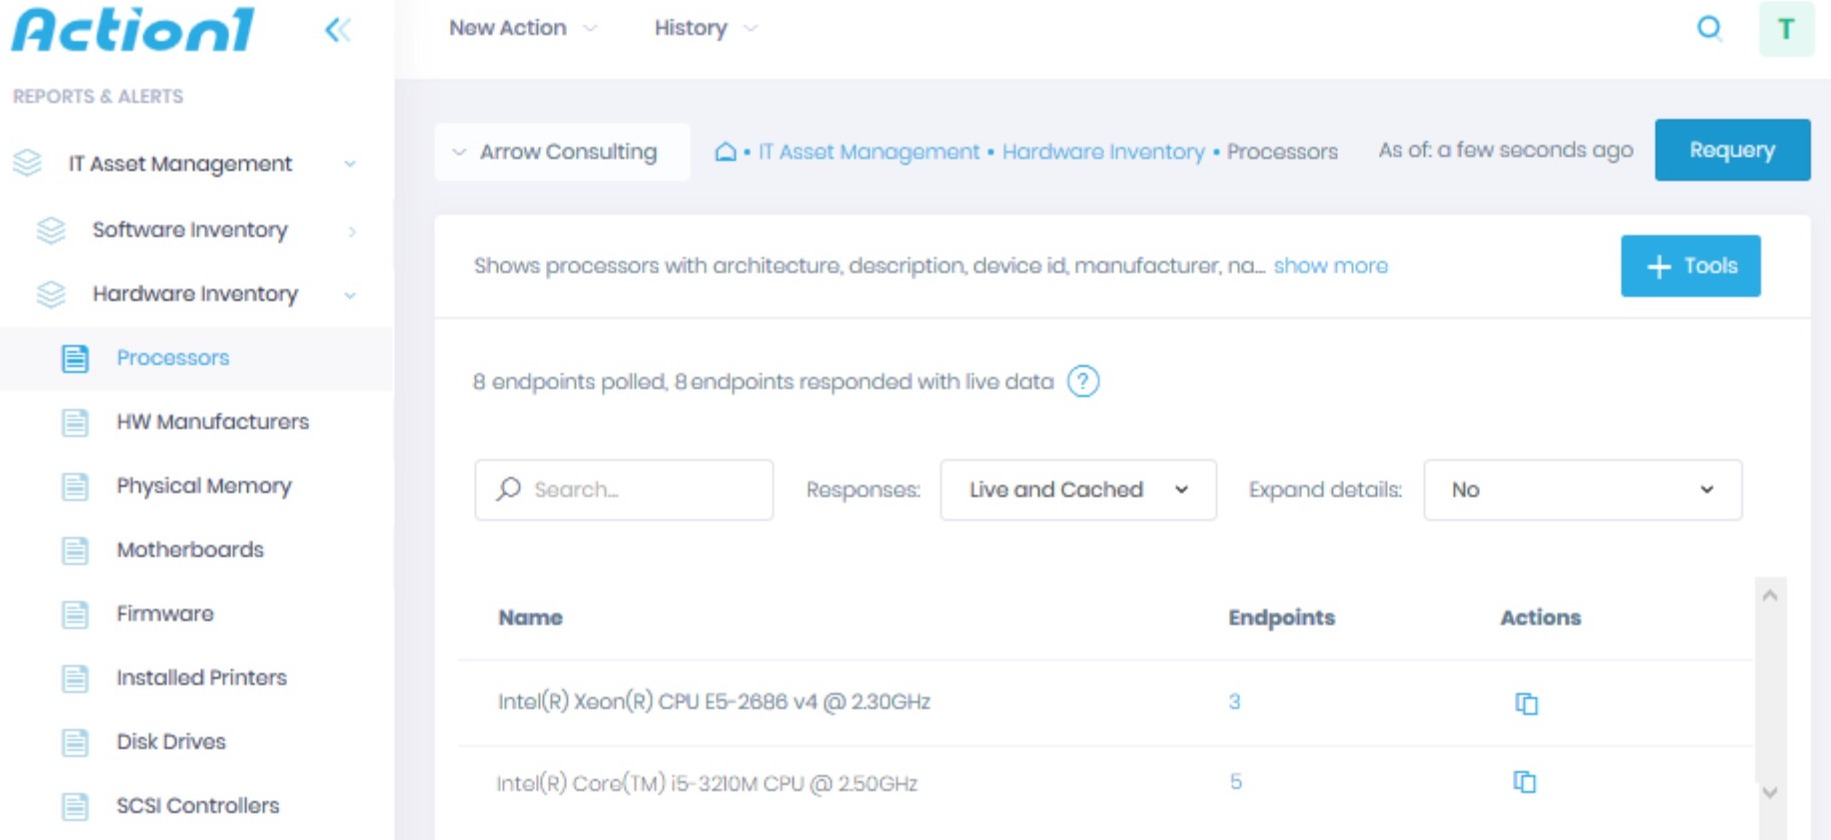 Action1 RMM IT Asset Inventory